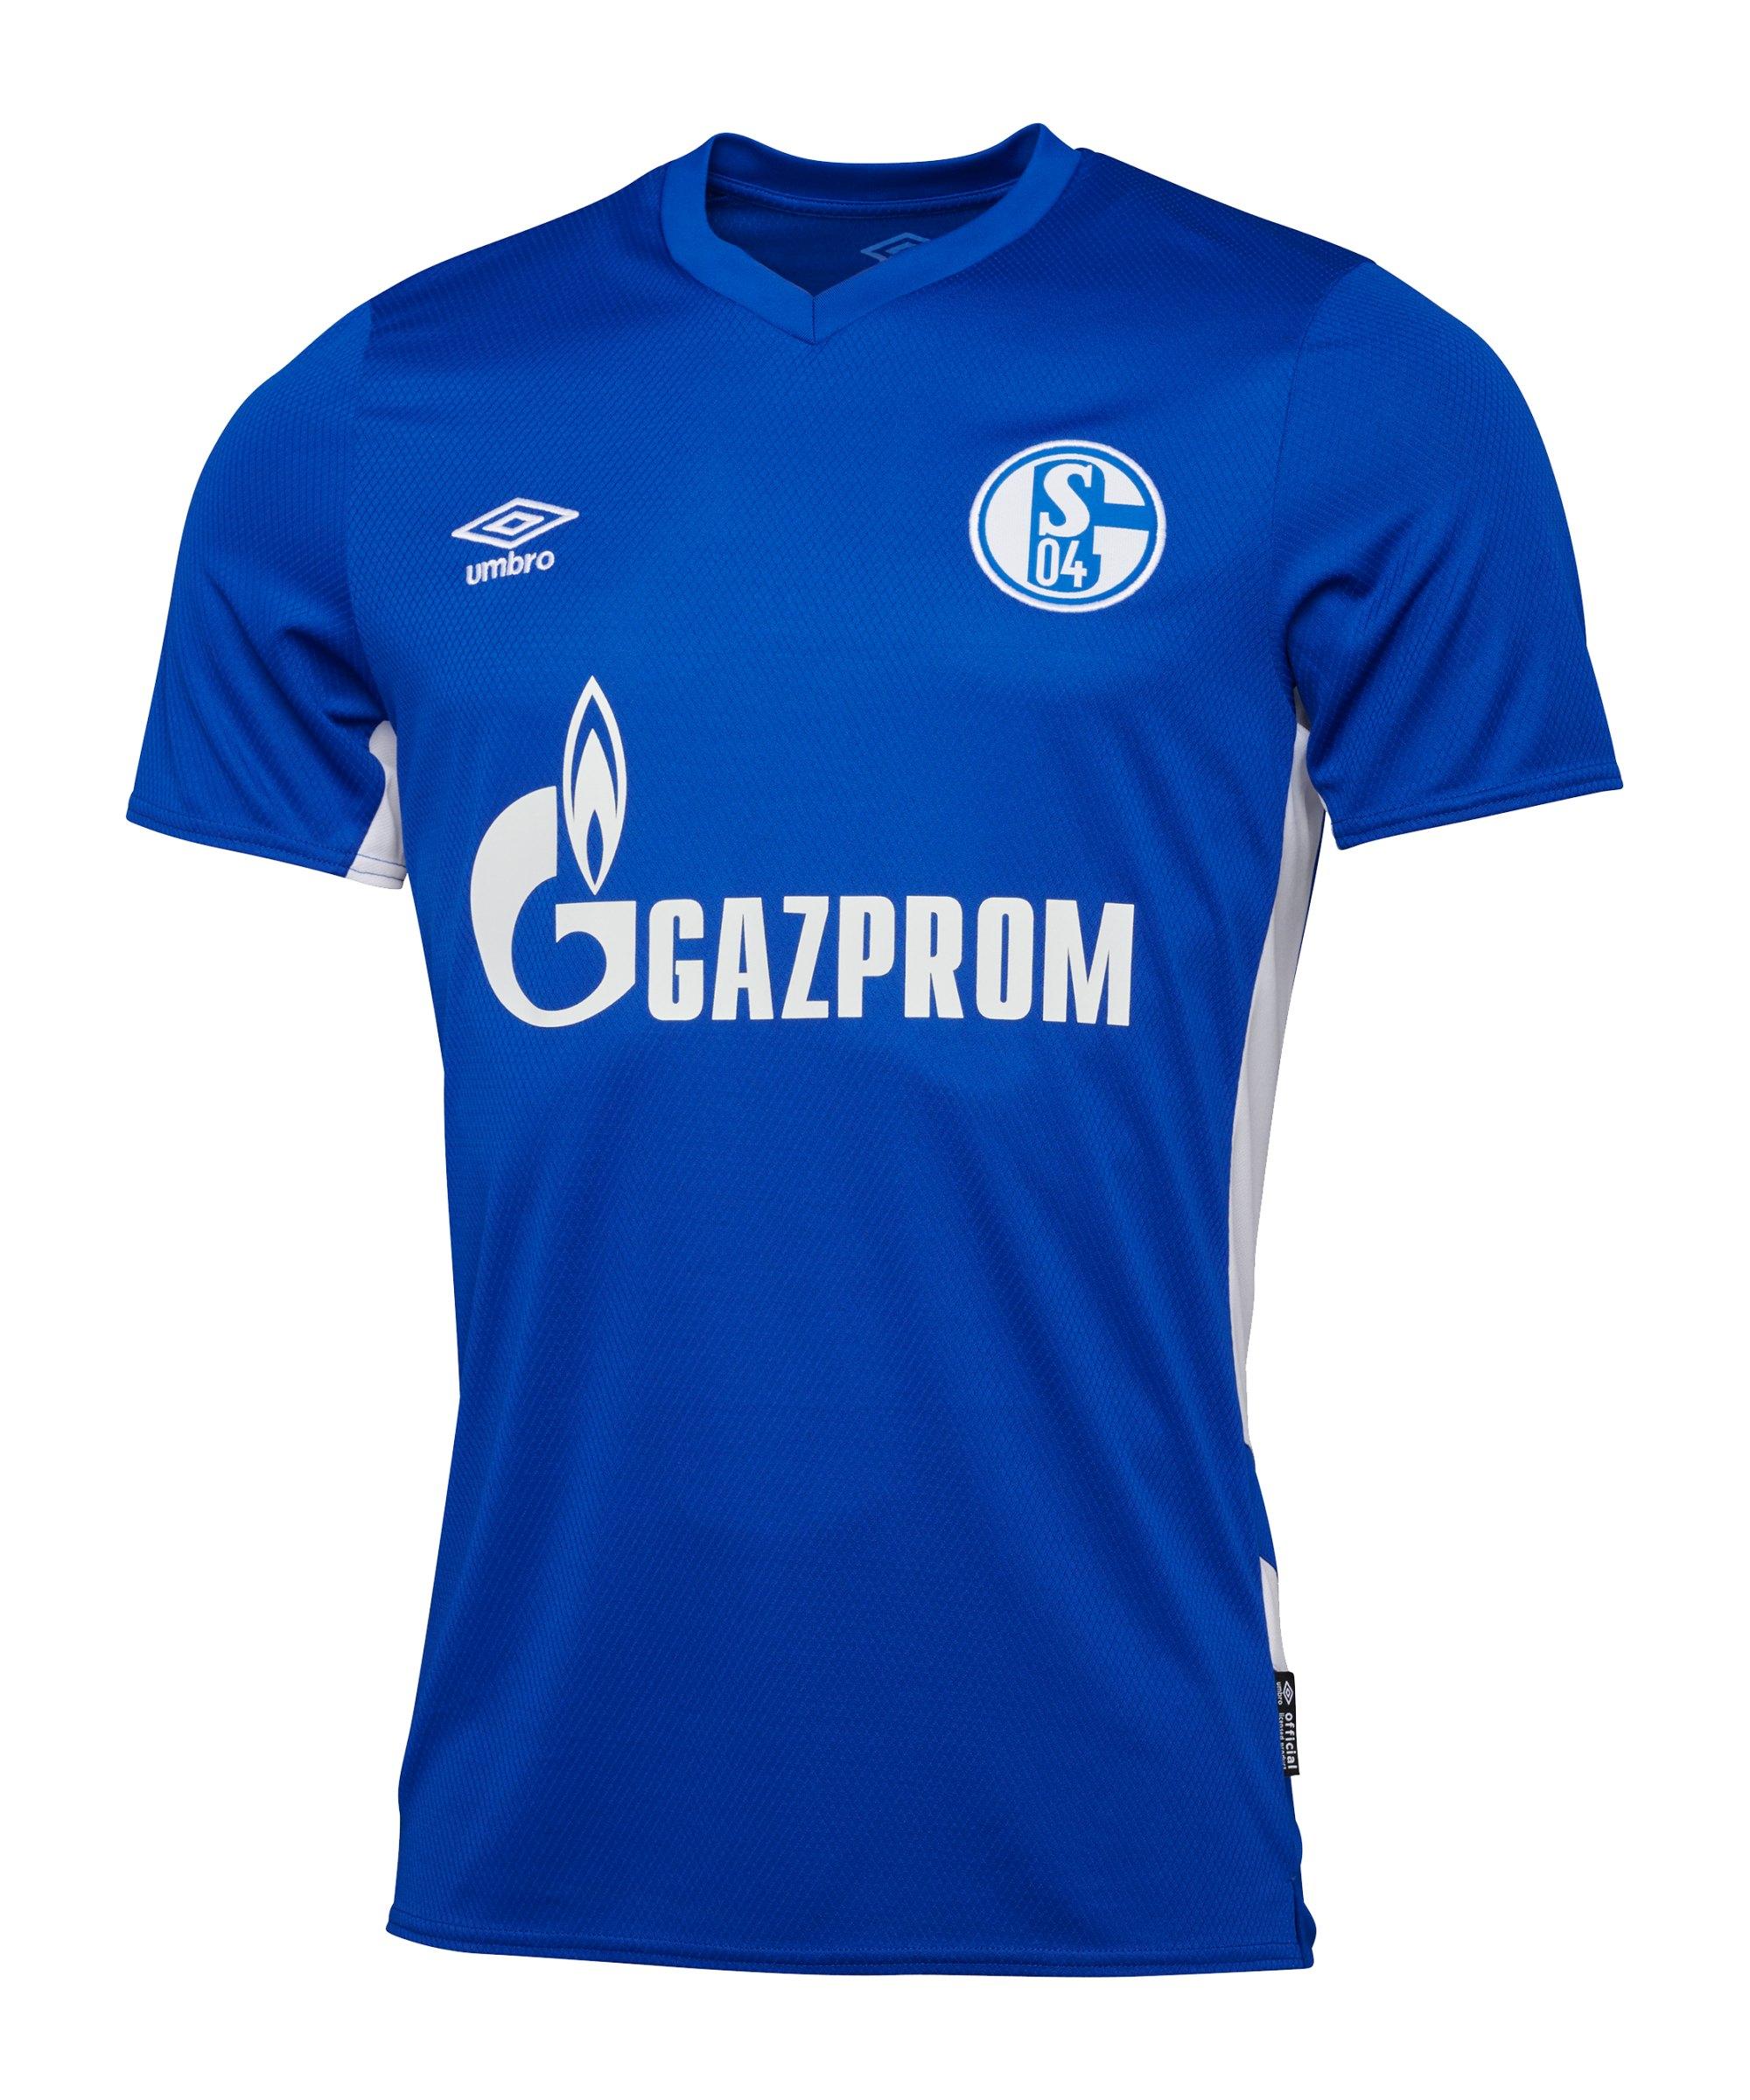 Umbro FC Schalke 04 Trikot Home 2021/2022 Blau - blau